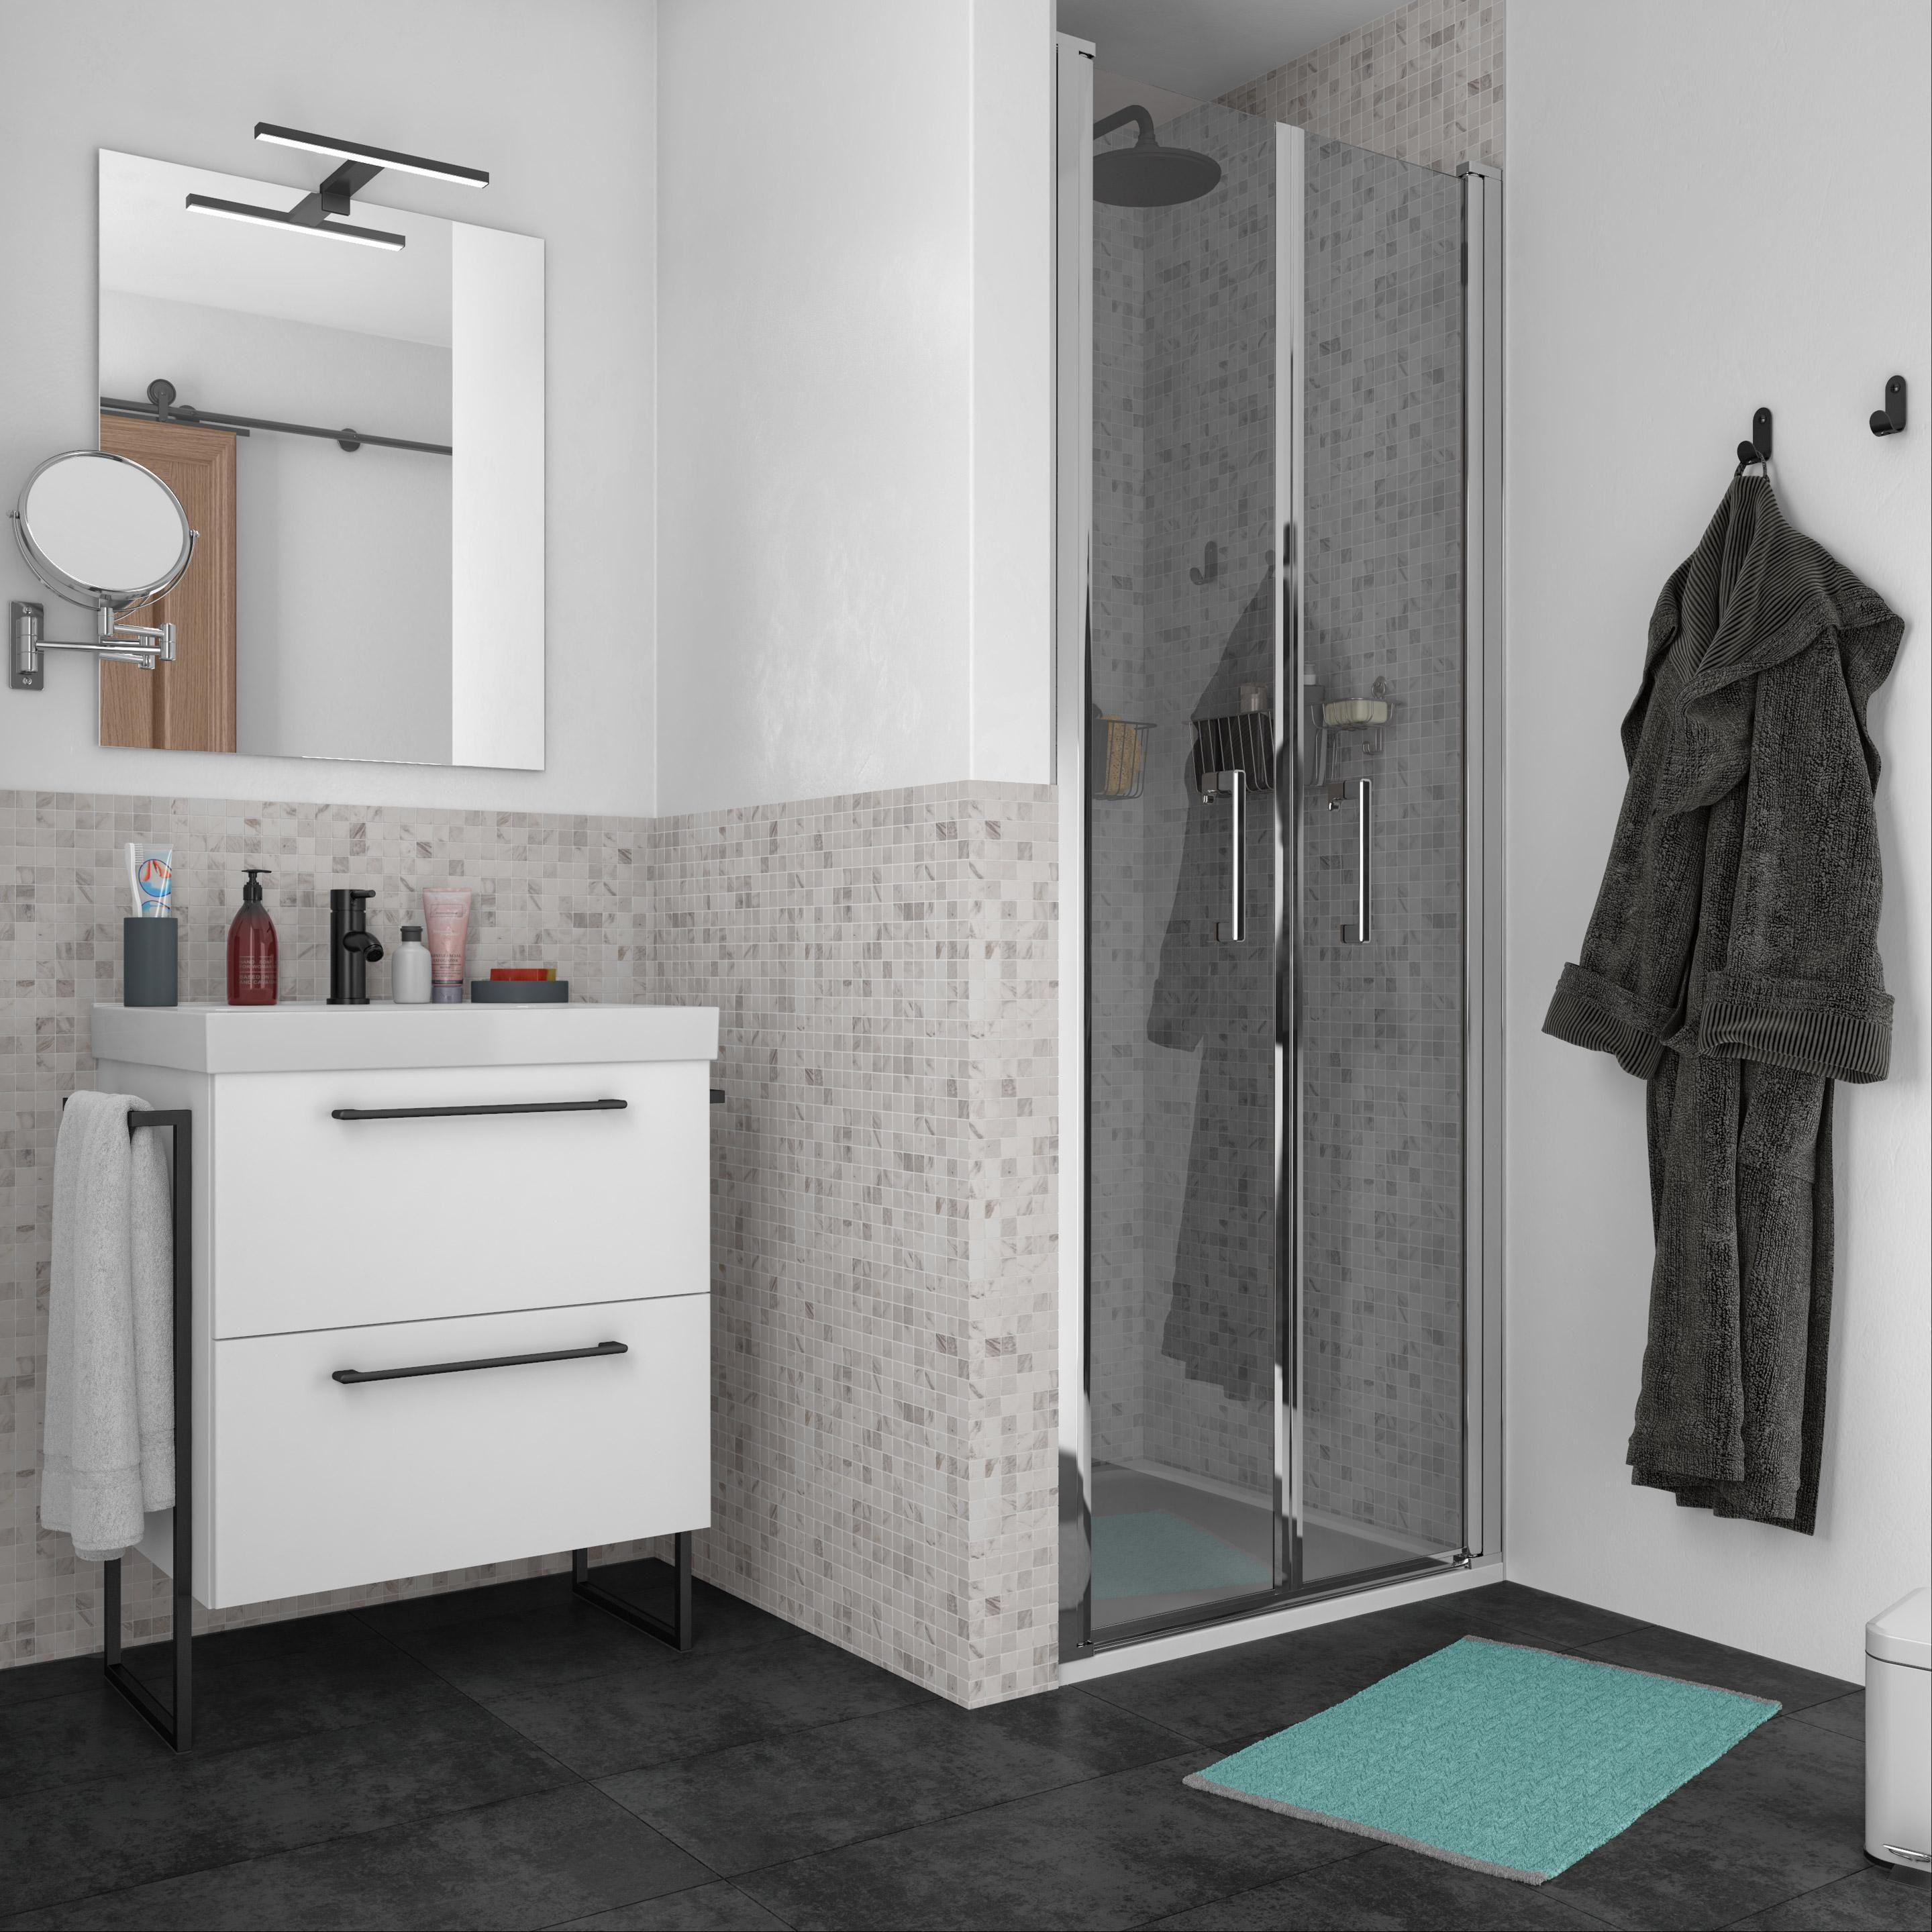 Meuble Salle De Bain Girona meuble simple vasque l.75 x h.58 x p.46 cm, blanc, remix